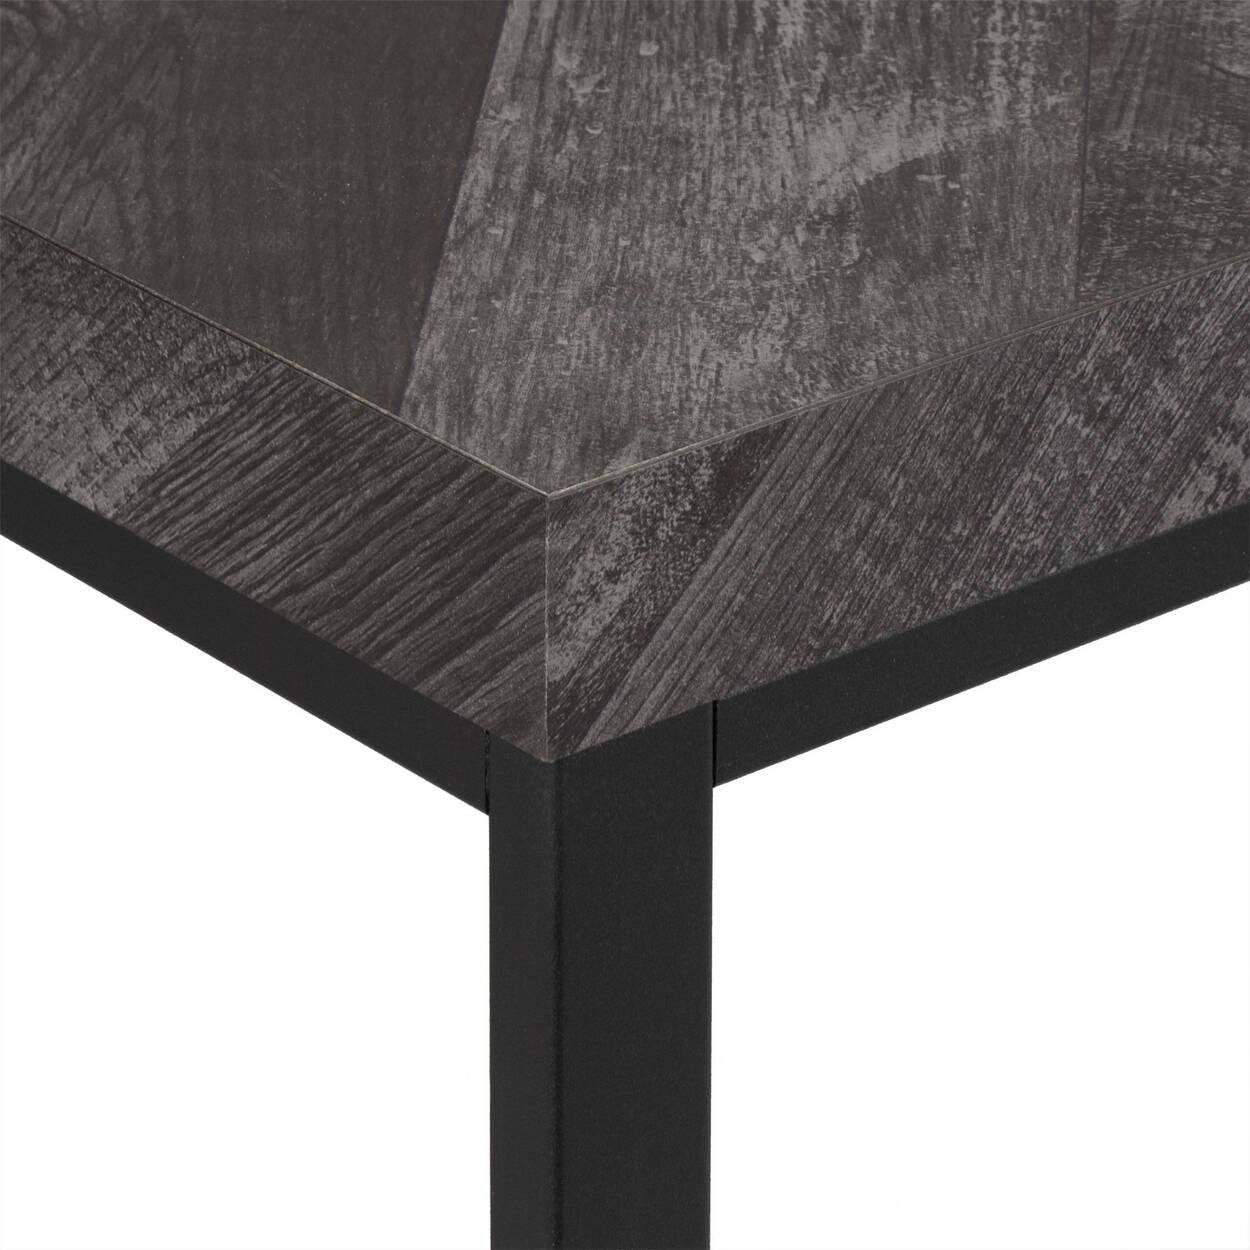 Veneer and Iron Coffee Table with Chevron